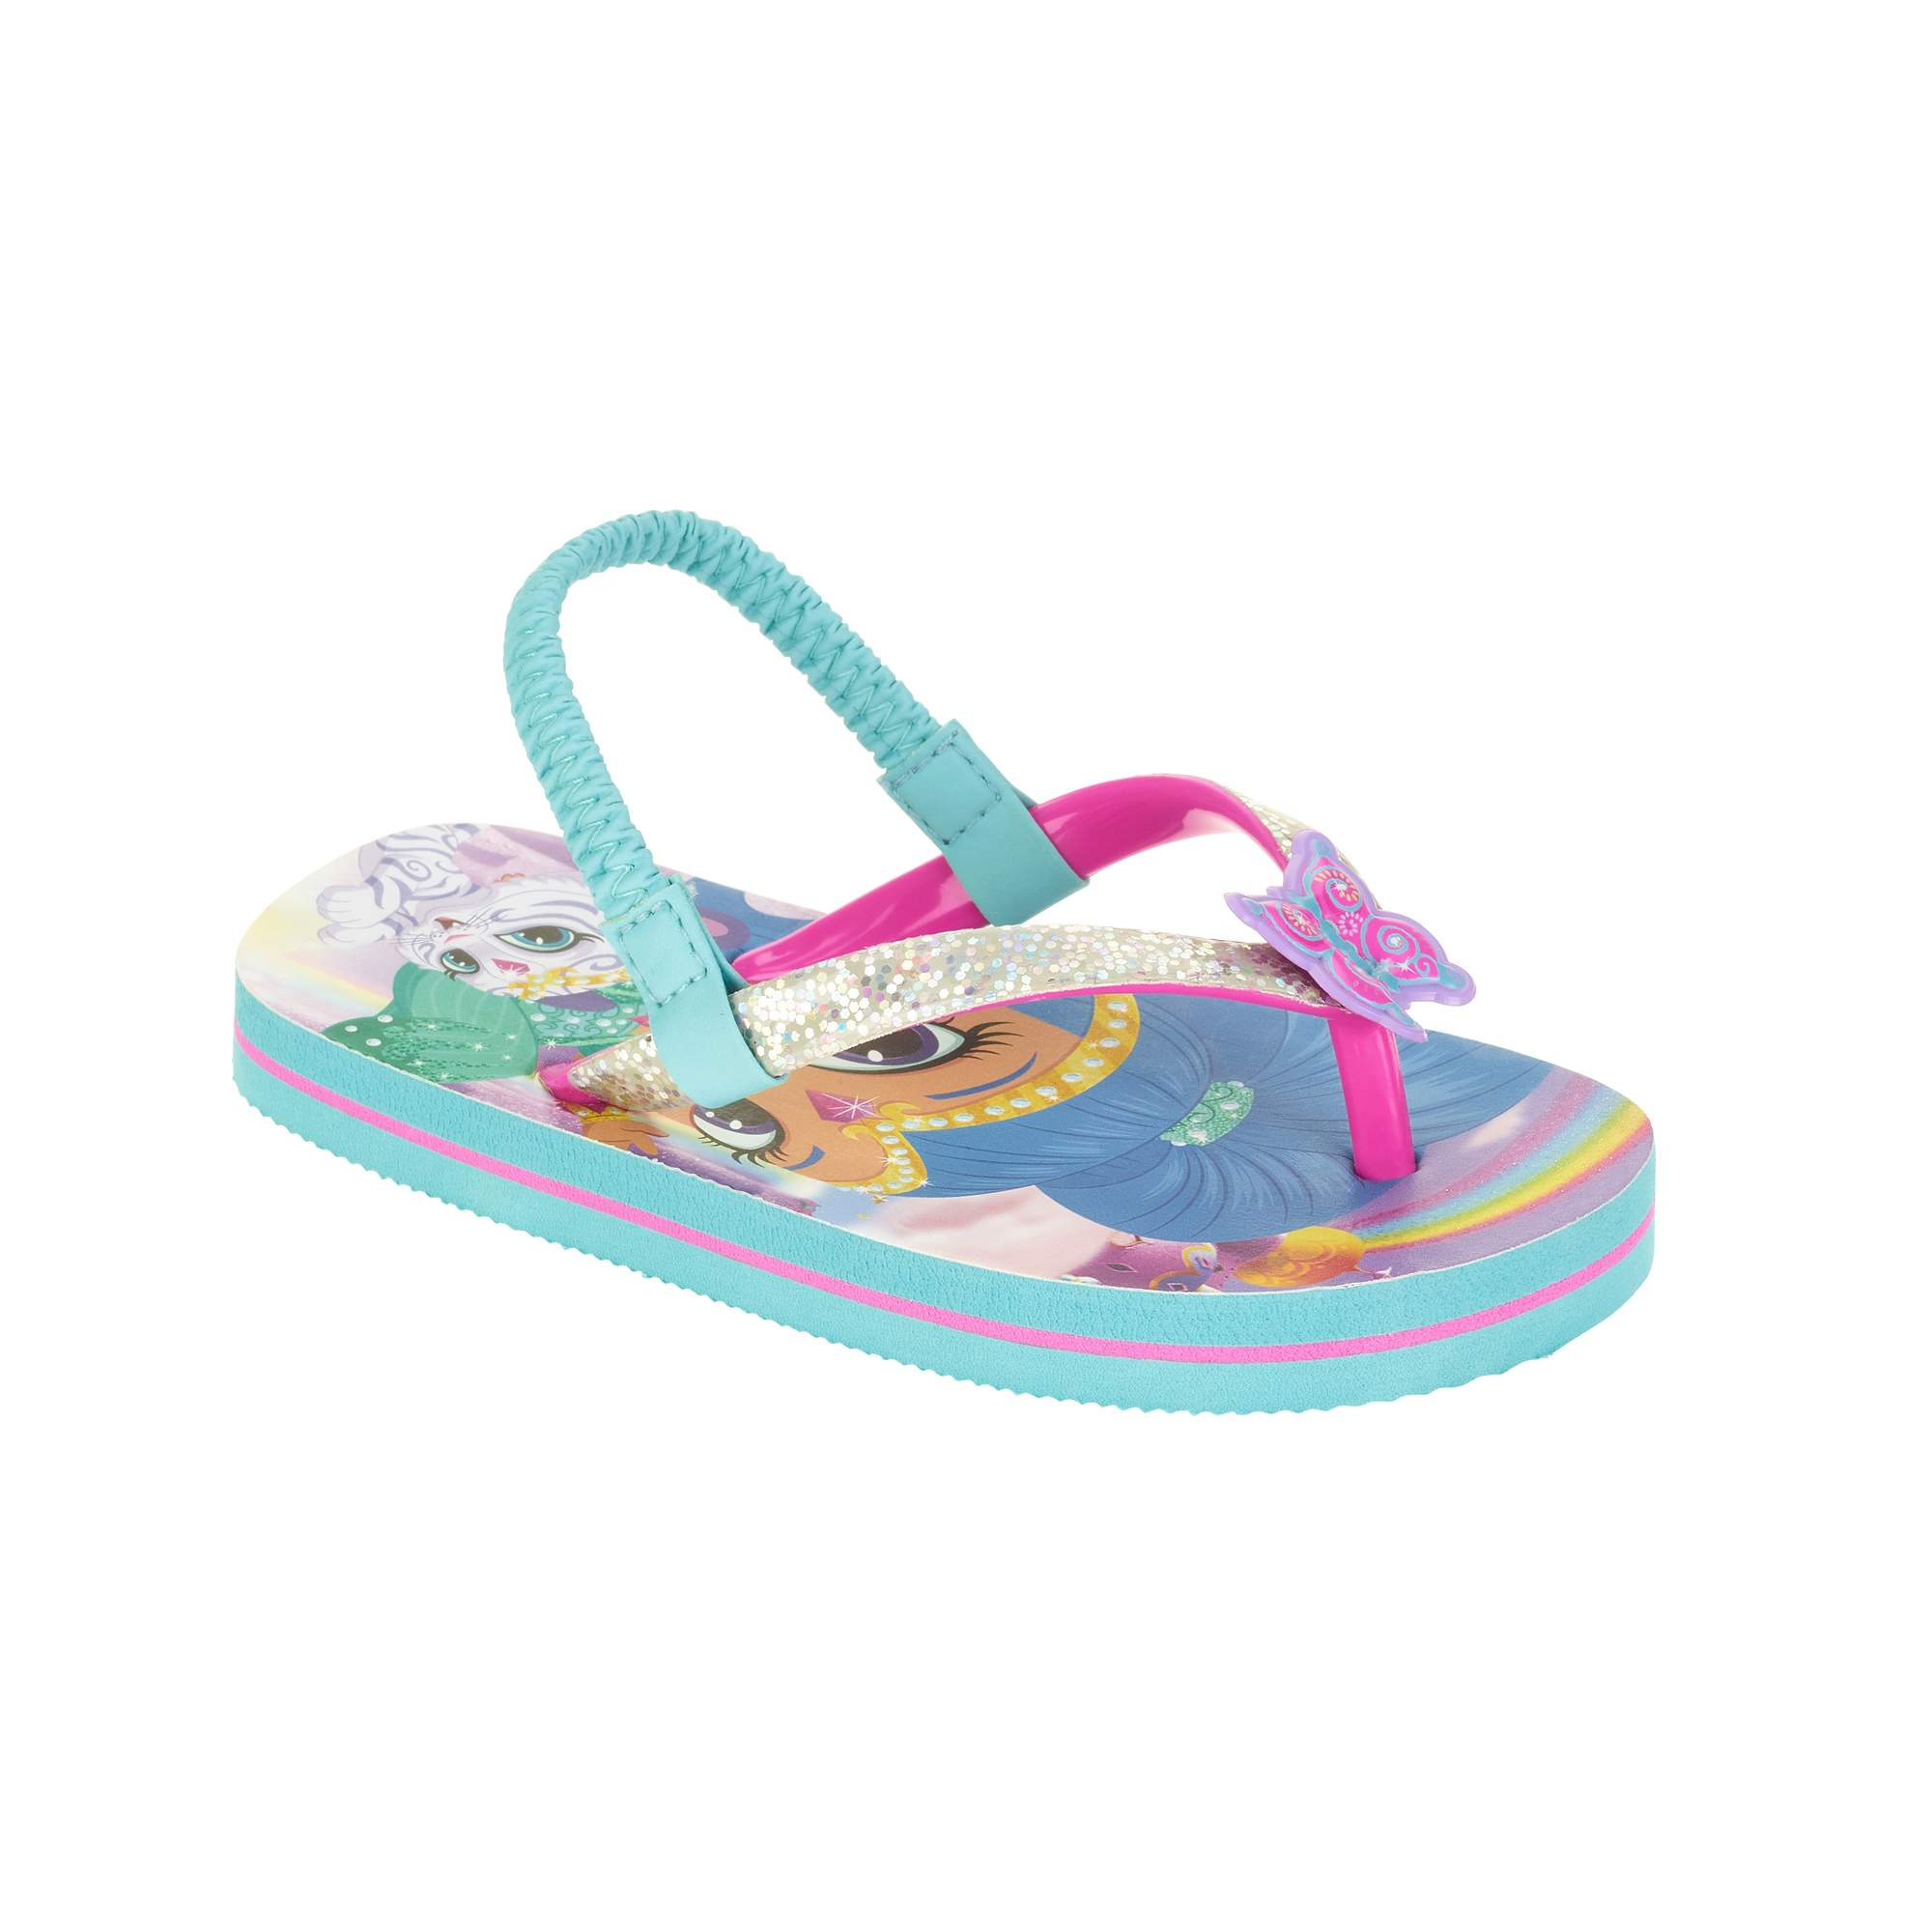 8326b41bf74e Shimmer and Shine Toddler Girls  Beach Flip Flop – Walmart Inventory ...